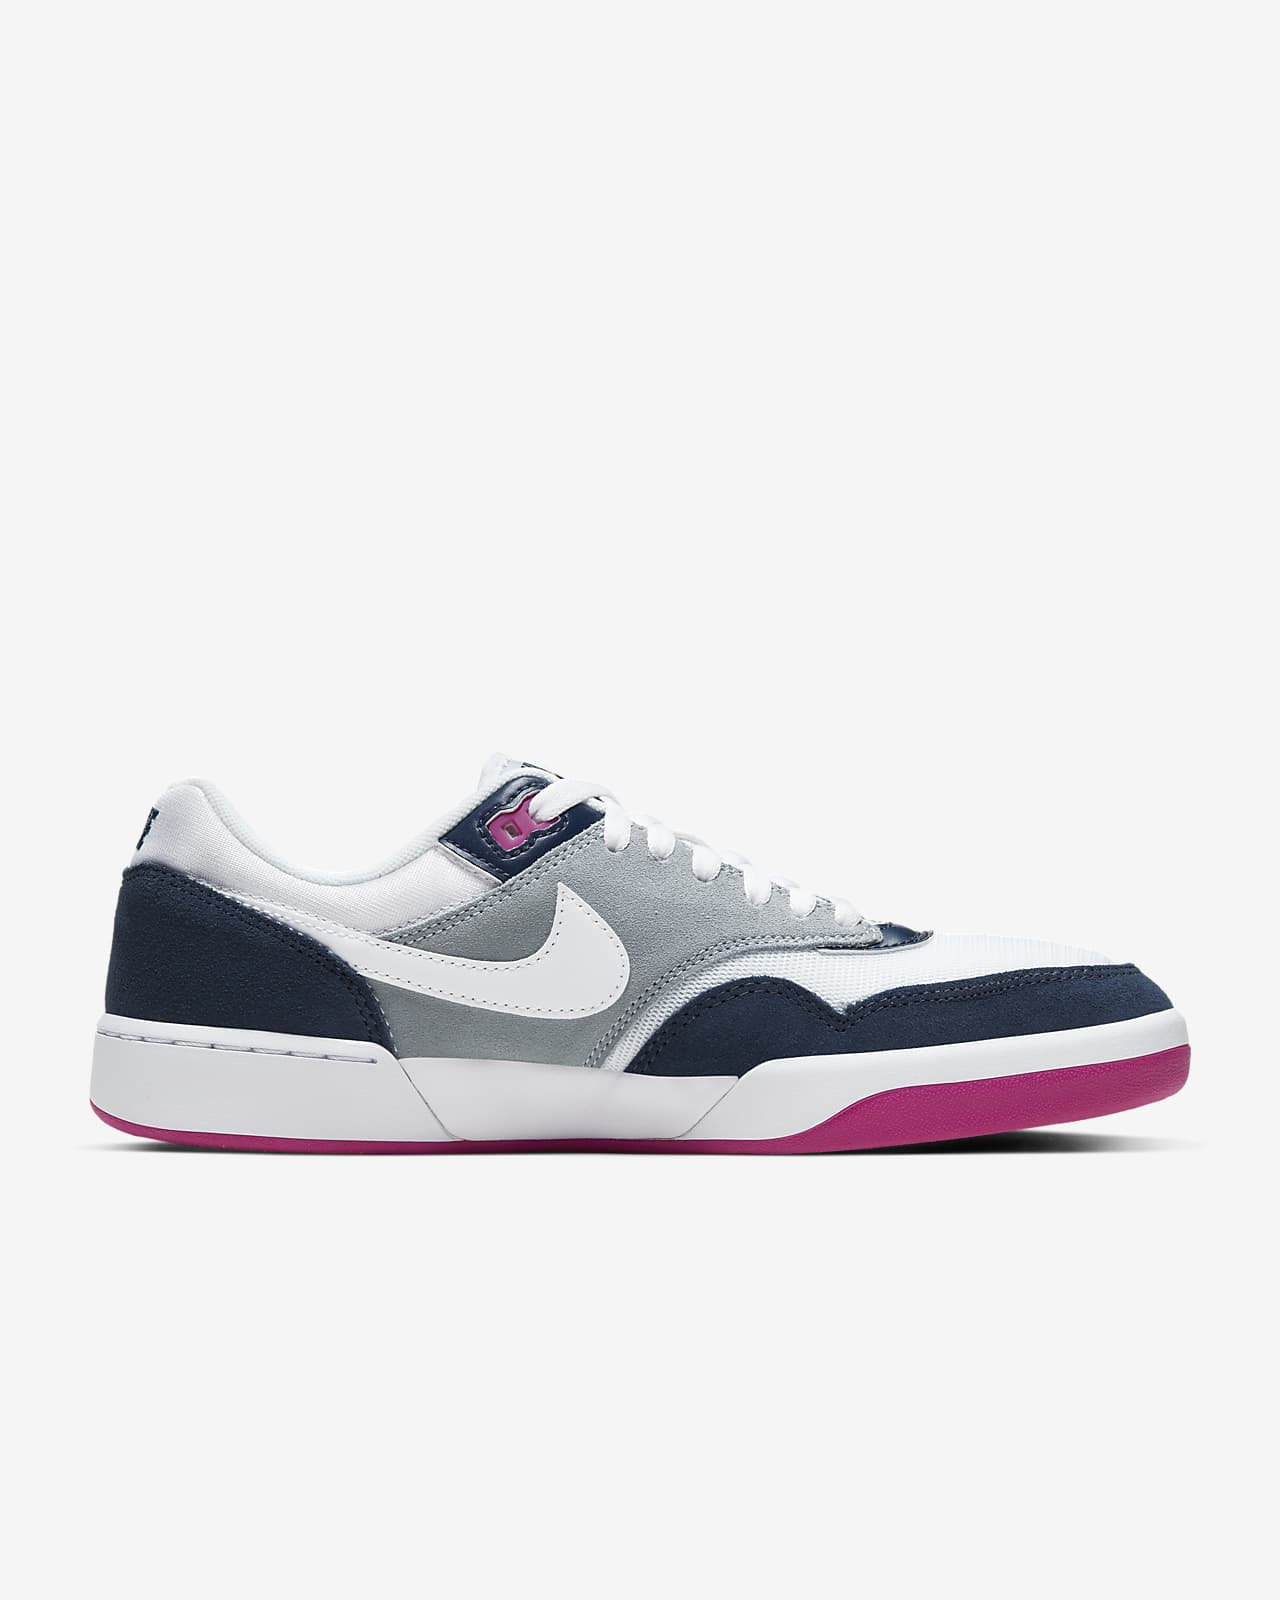 Nike SB GTS Return, midnight navy white | Beyond